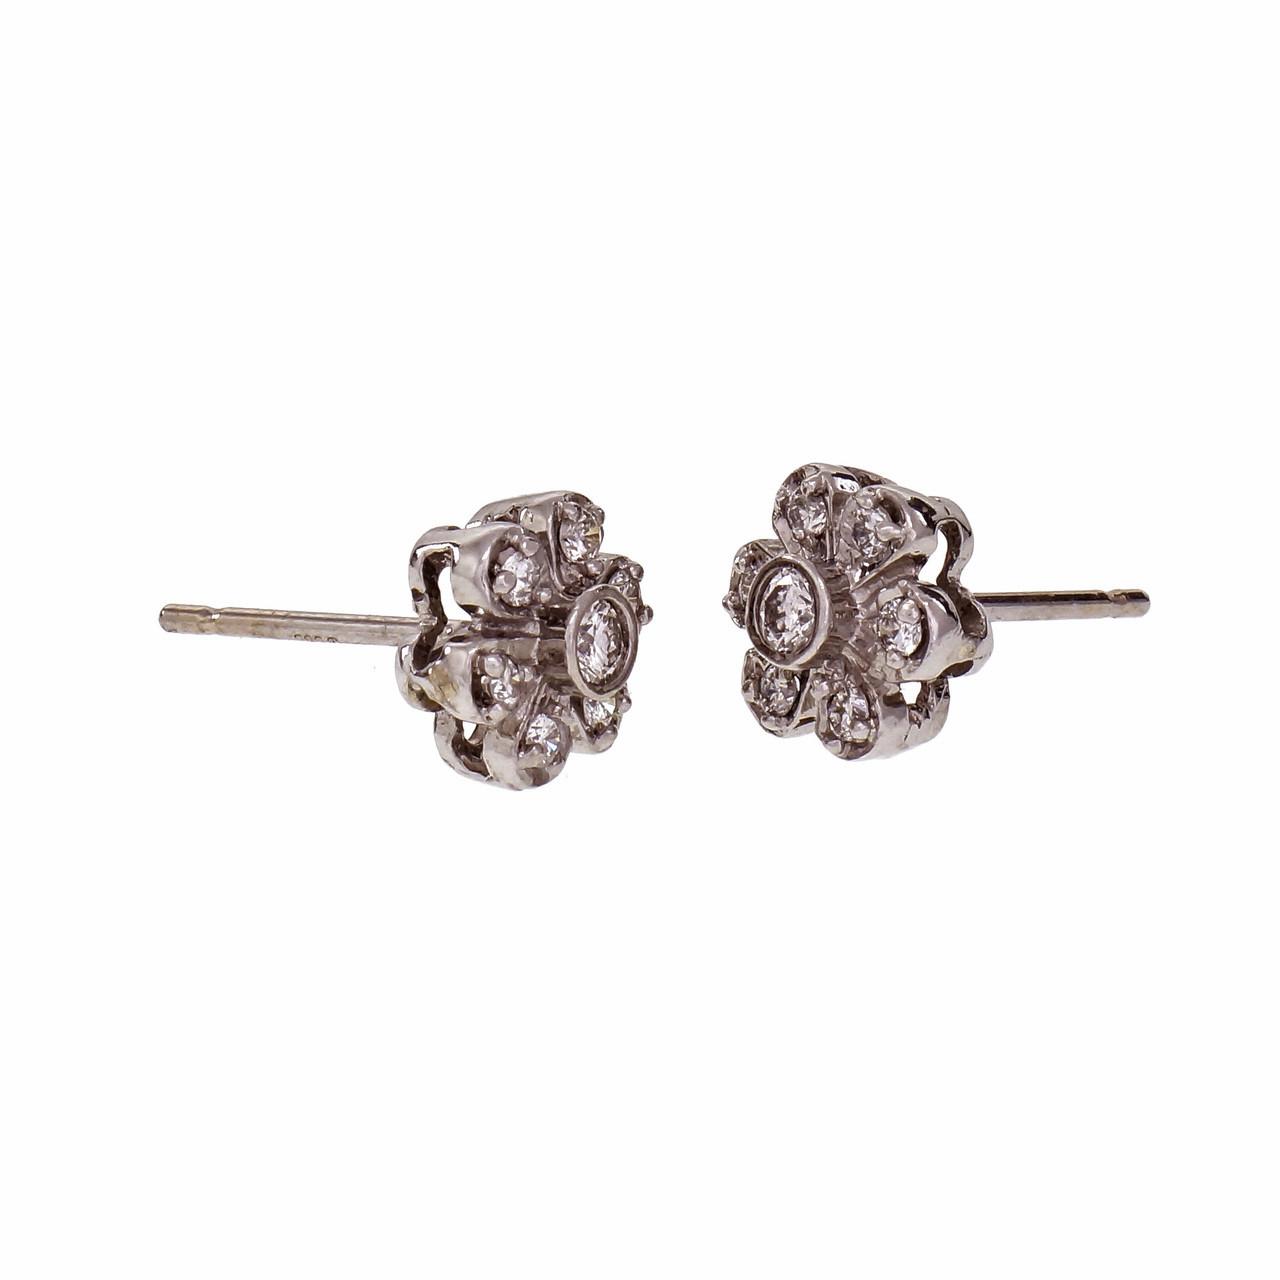 340fb6b1b Diamond Flower Cluster Stud Earrings 14k White Gold - petersuchyjewelers